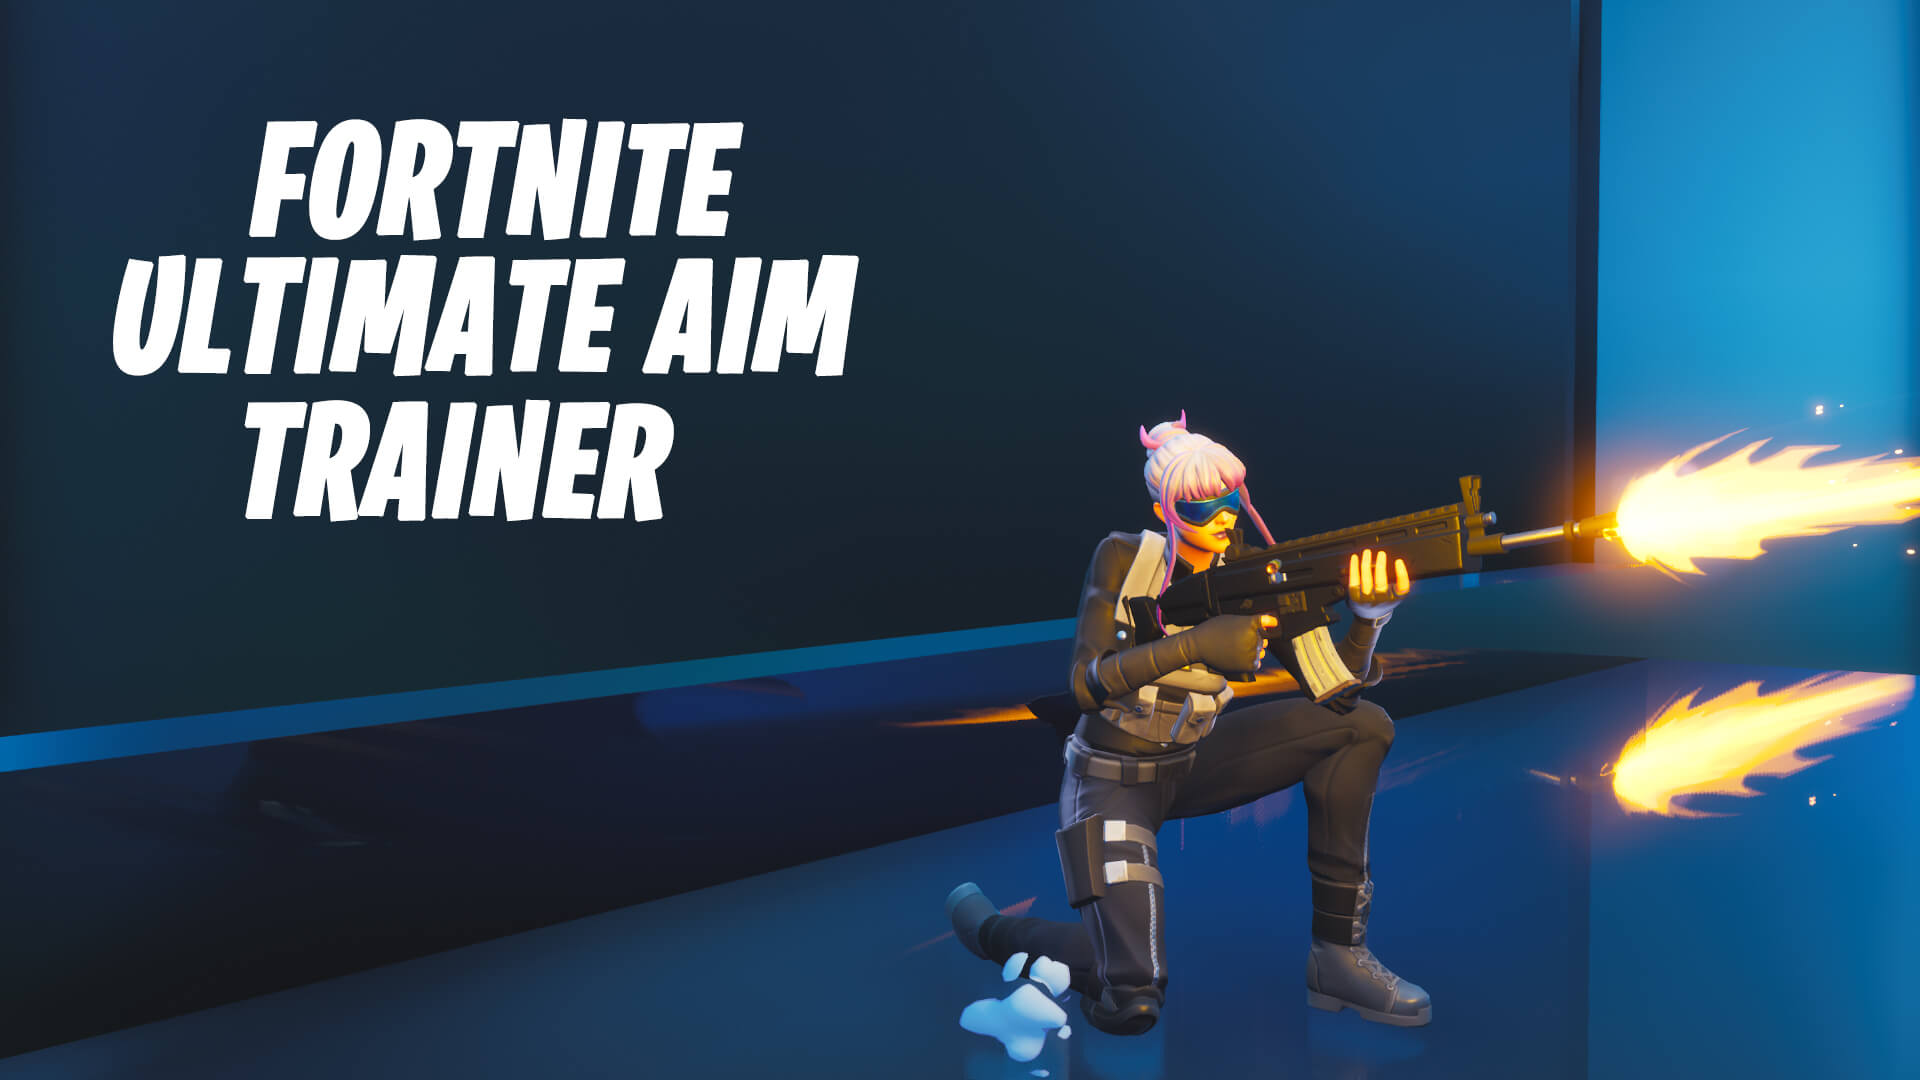 Better Aim In Fortnite Pc Ultimate Aim Training Course Fortnite Creative Map Code Dropnite